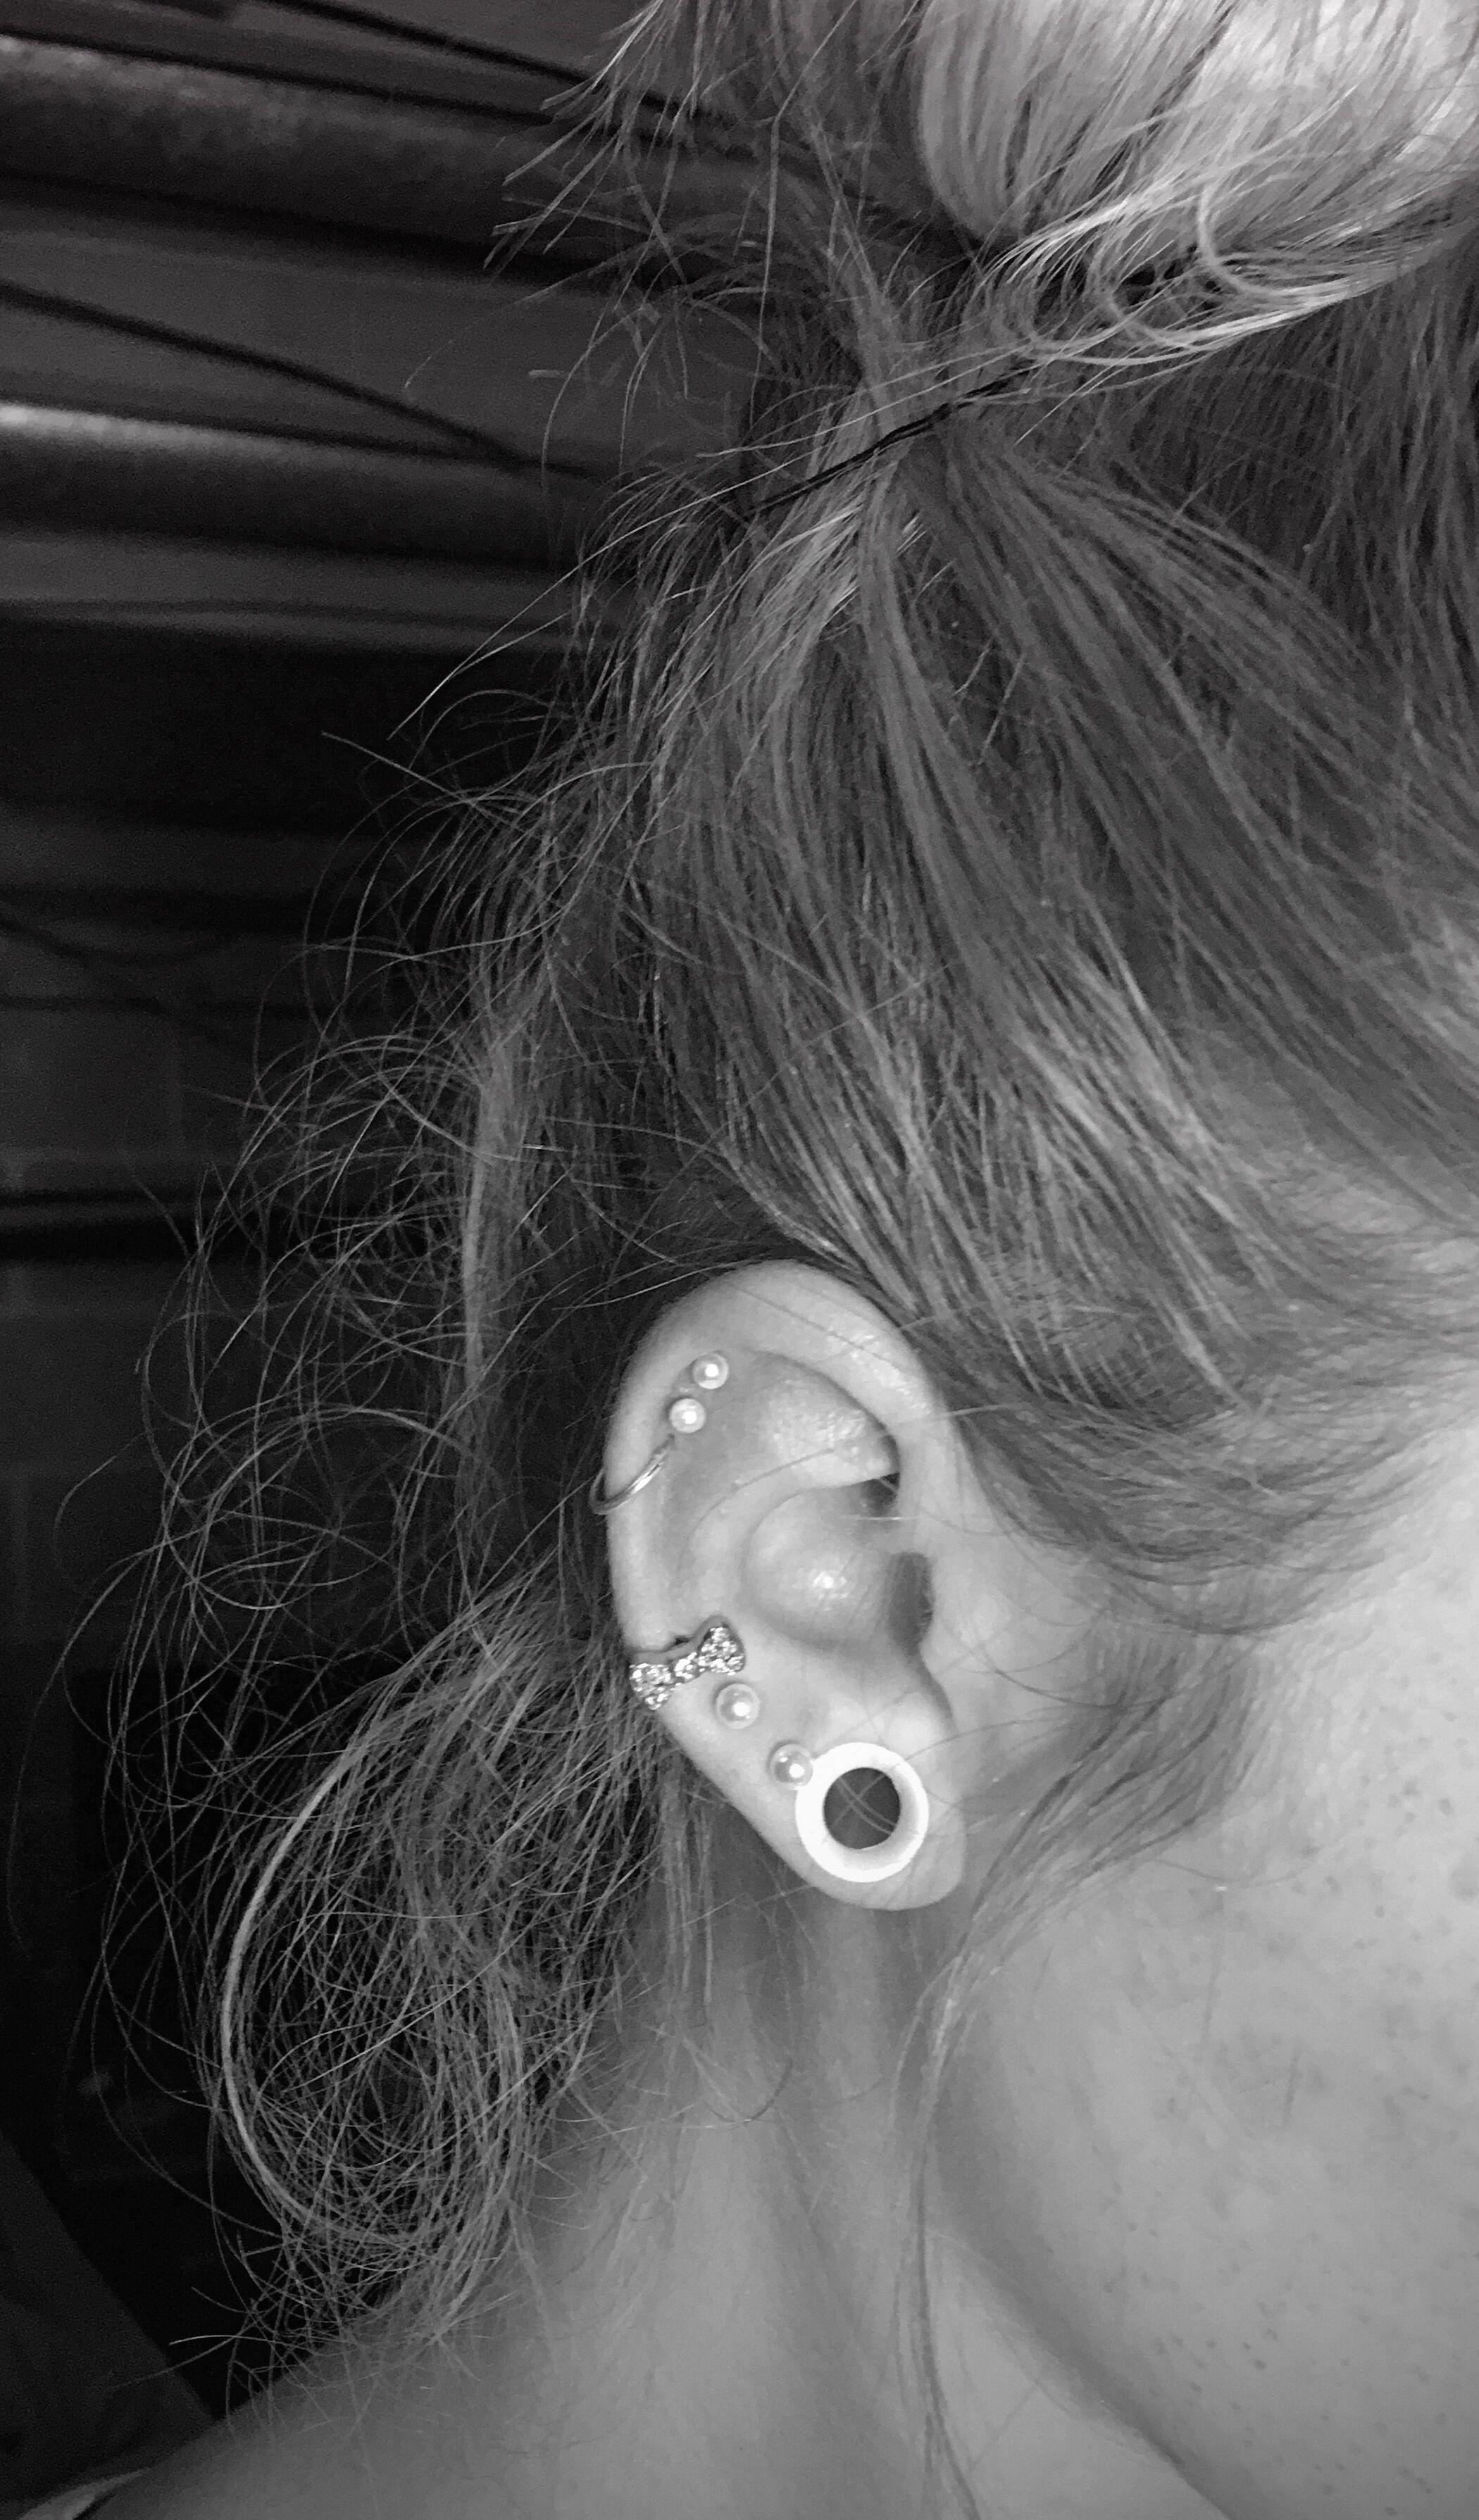 Nose piercing day 3  Pin by Dani Hartley on piercings  Pinterest  Piercings